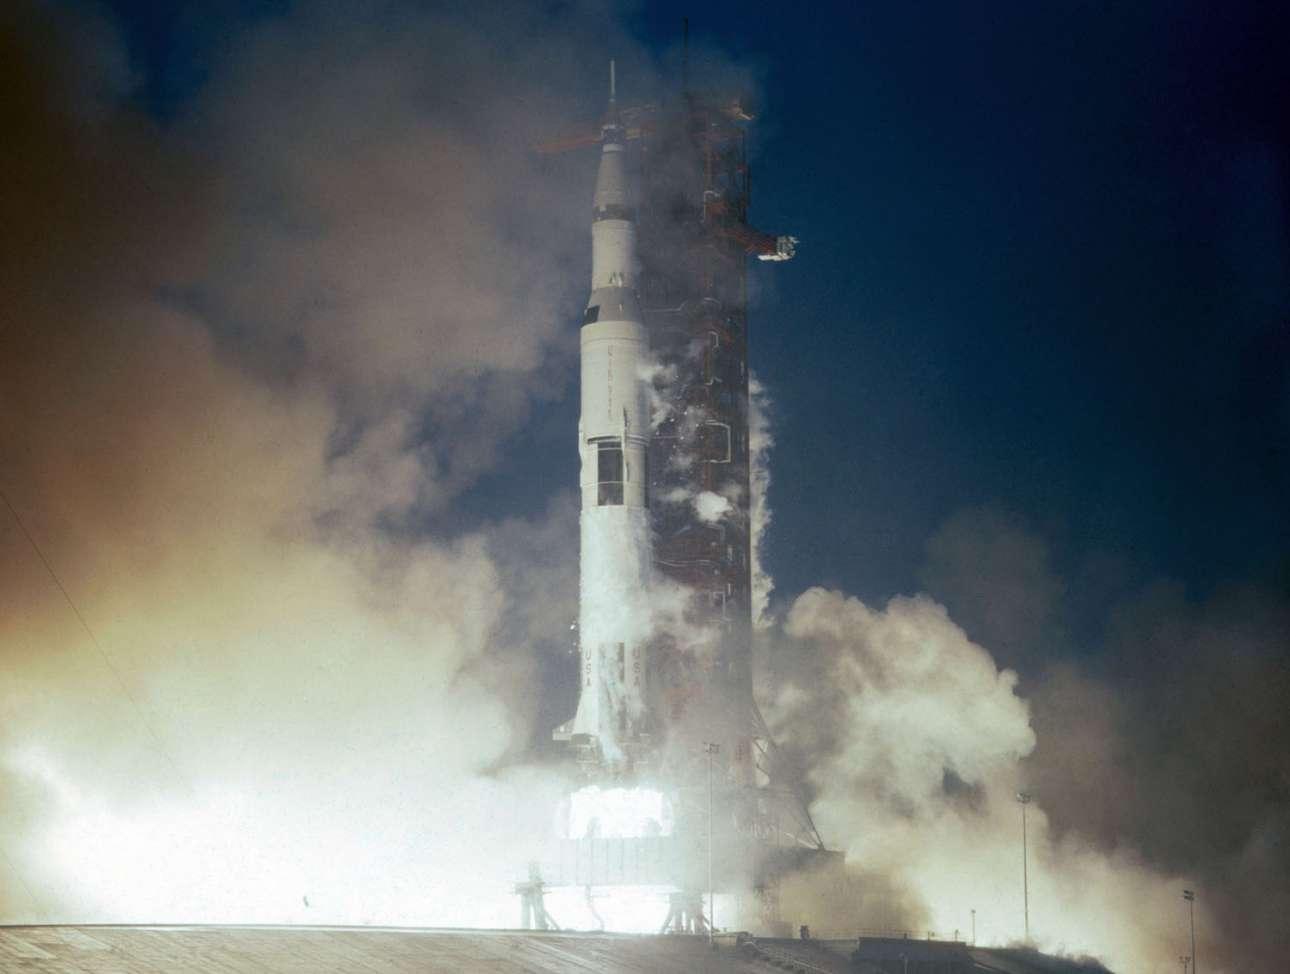 To 110 μέτρων διαστημόπλοιο εκτοξεύεται στις 23.22 τοπική ώρα στις 14 Νοεμβρίου 1969